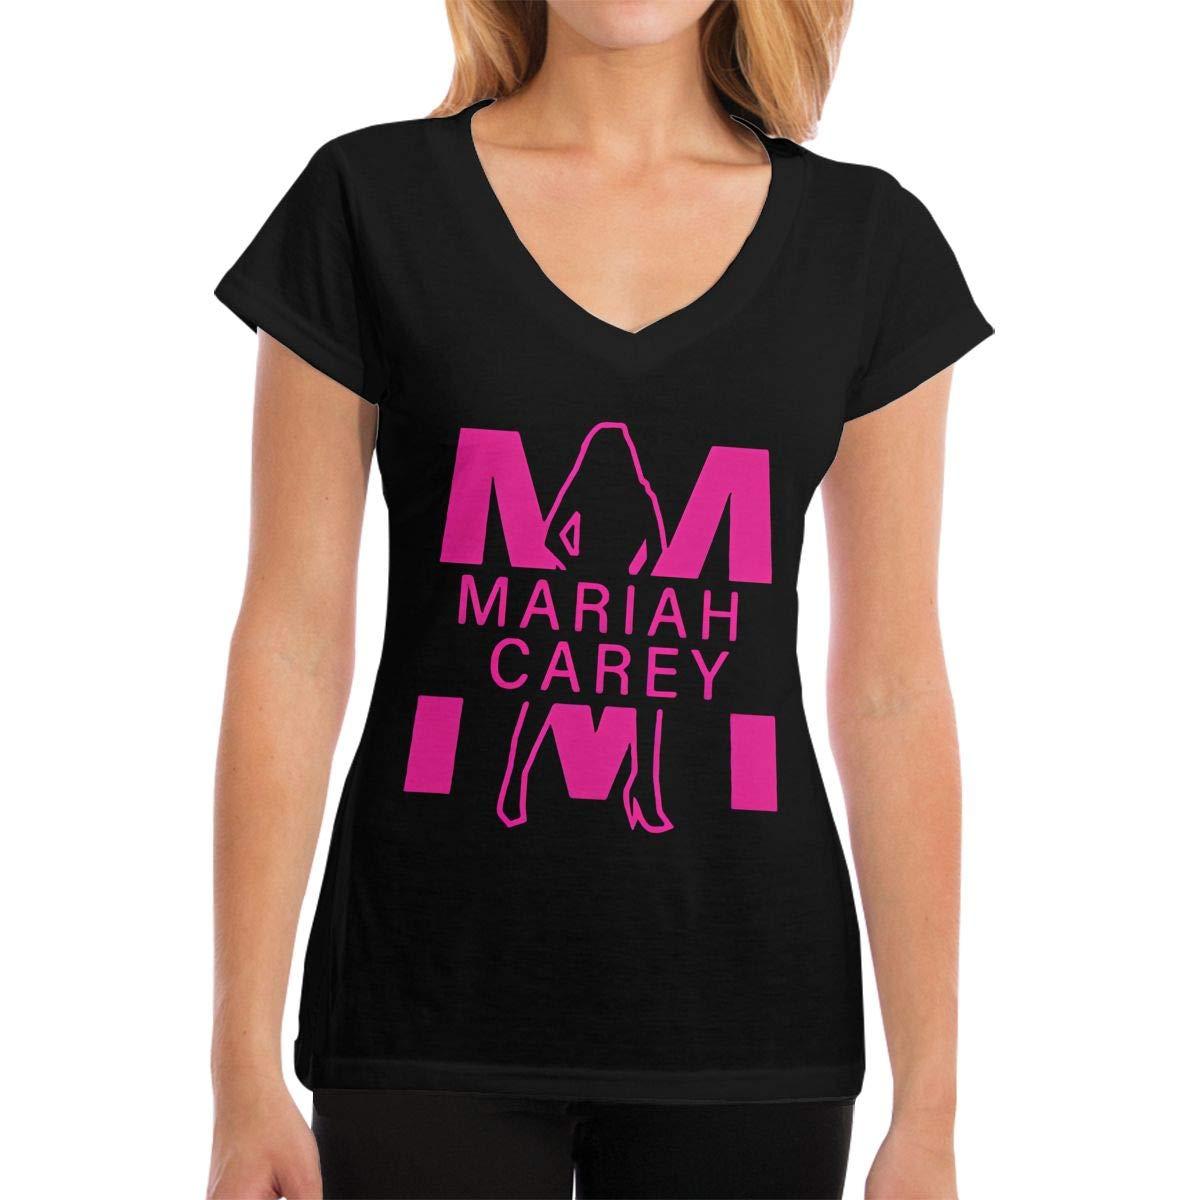 Rray Mariah Carey T Shirt Short Sleeve Fashion Casual Tees 6325